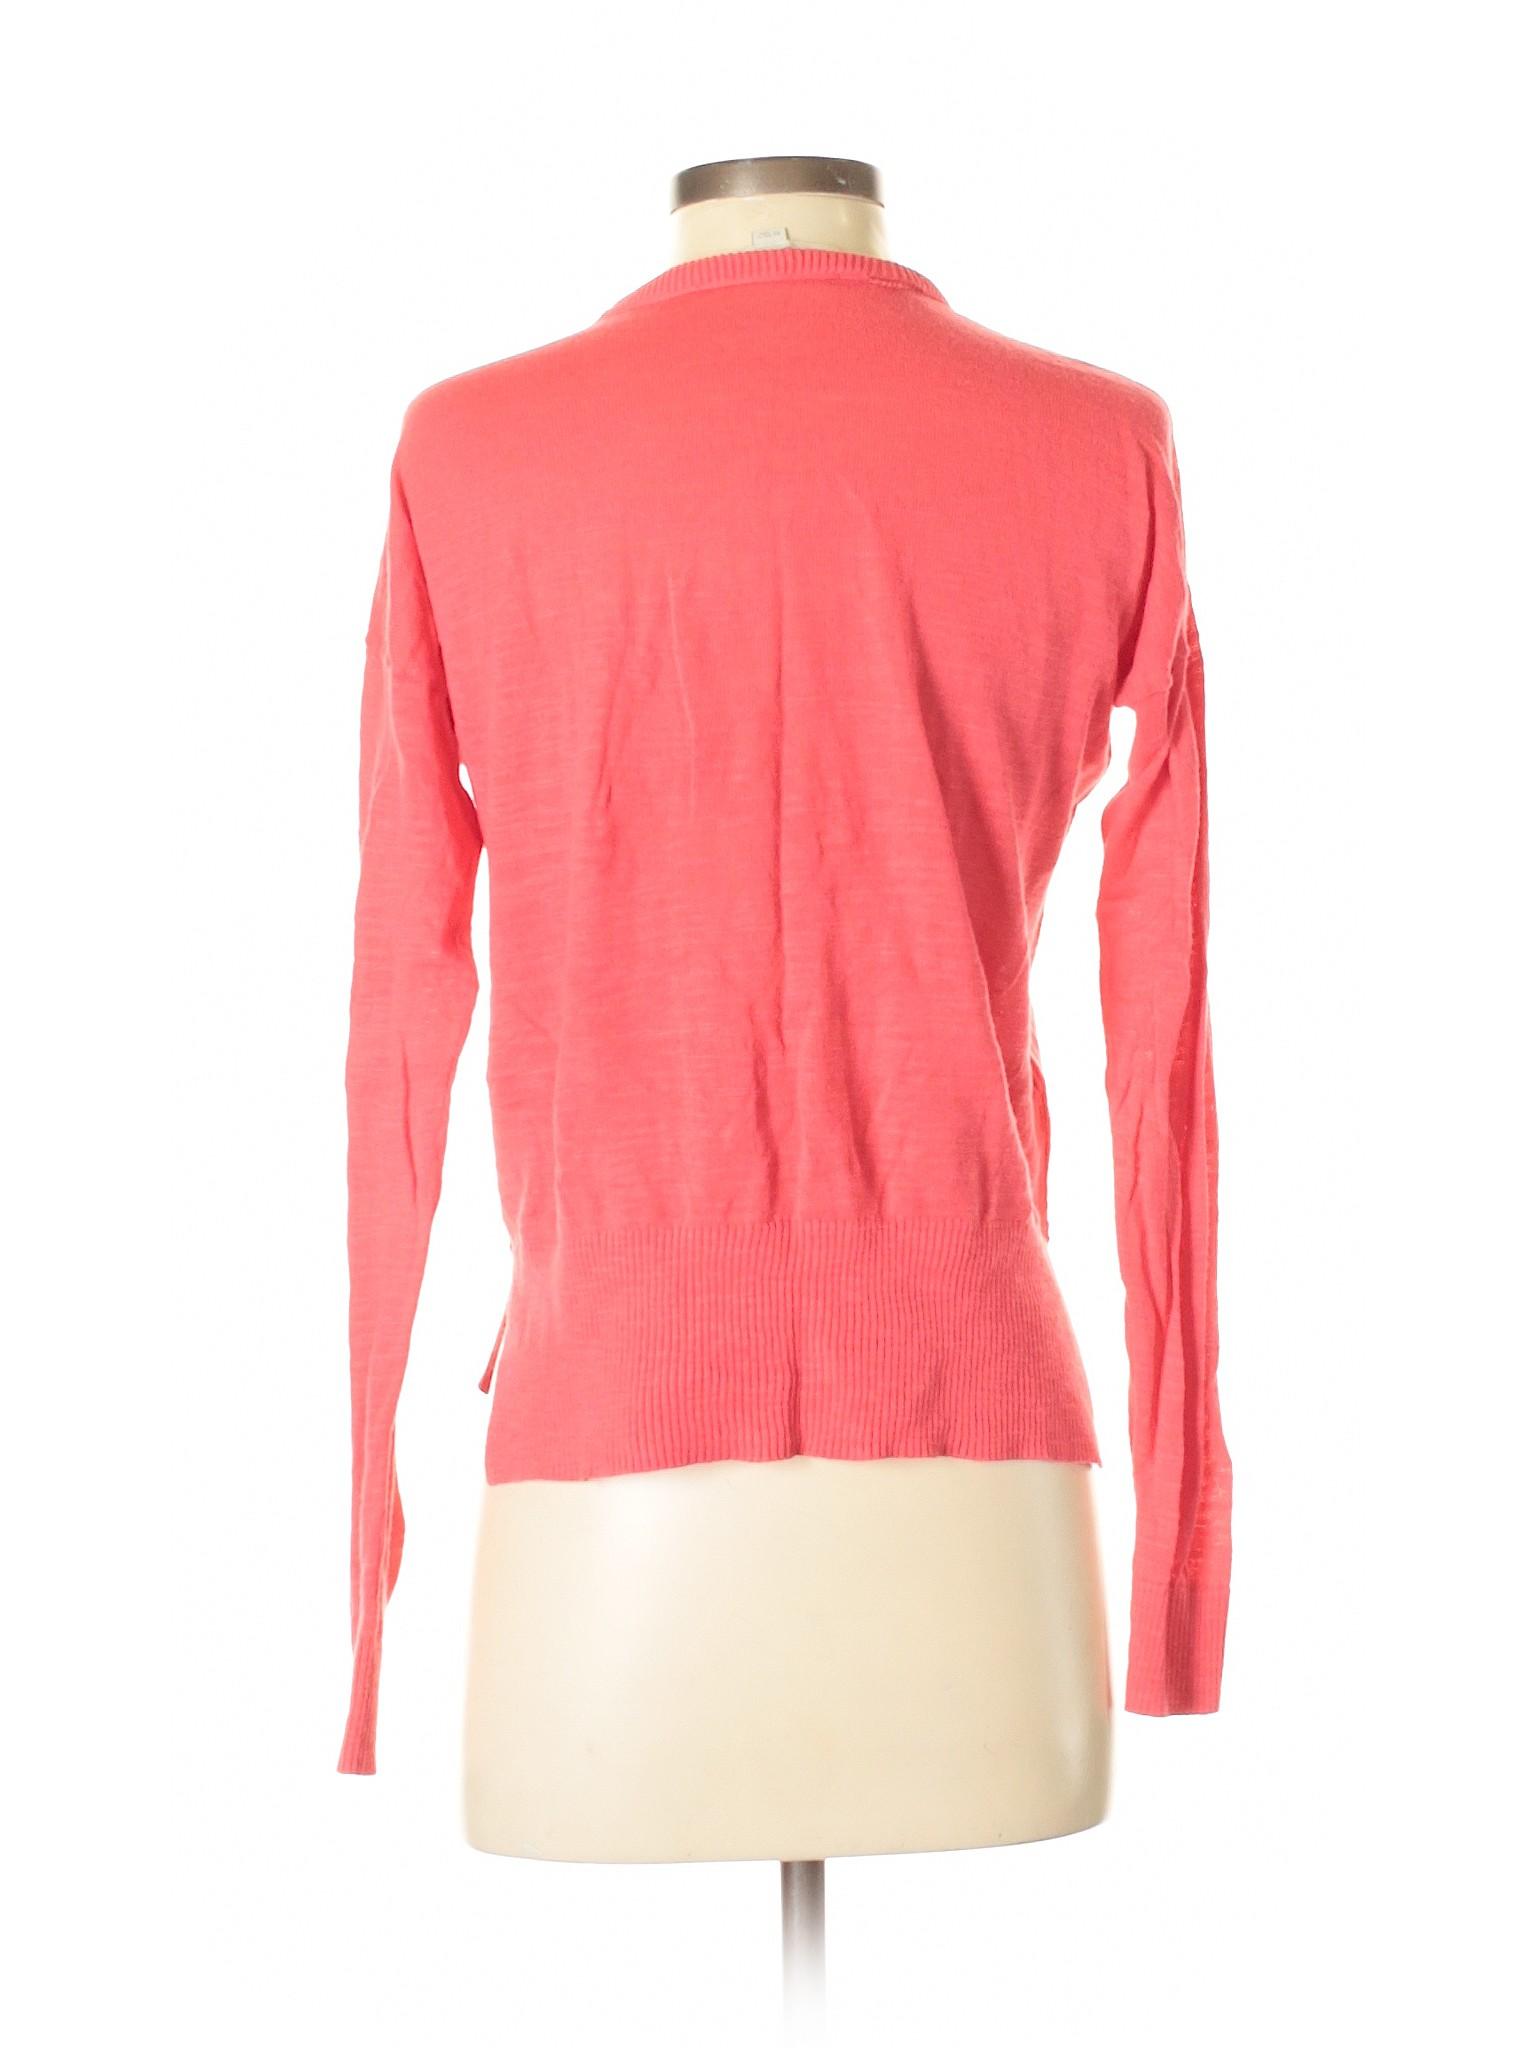 Ann Boutique winter Taylor LOFT Cardigan R5wq7F71